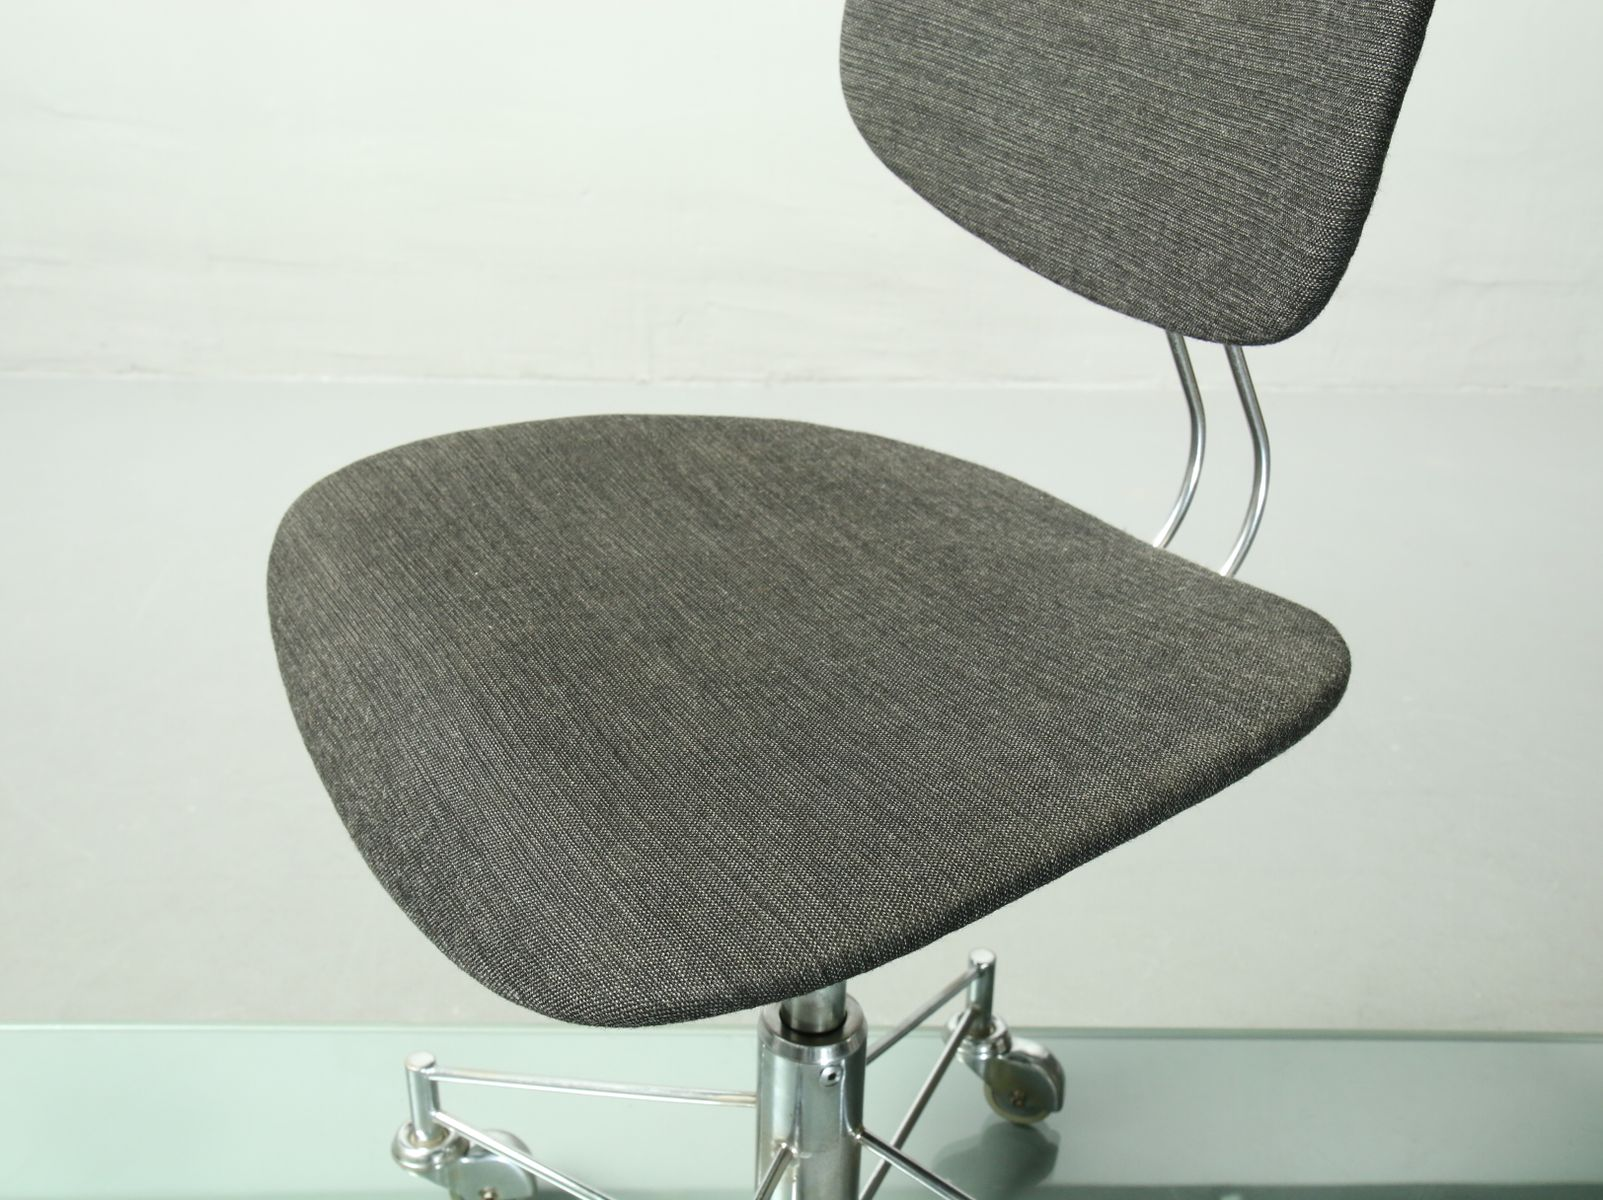 se 140 r office chair by egon eiermann for wilde spieth 1950s bei pamono kaufen. Black Bedroom Furniture Sets. Home Design Ideas